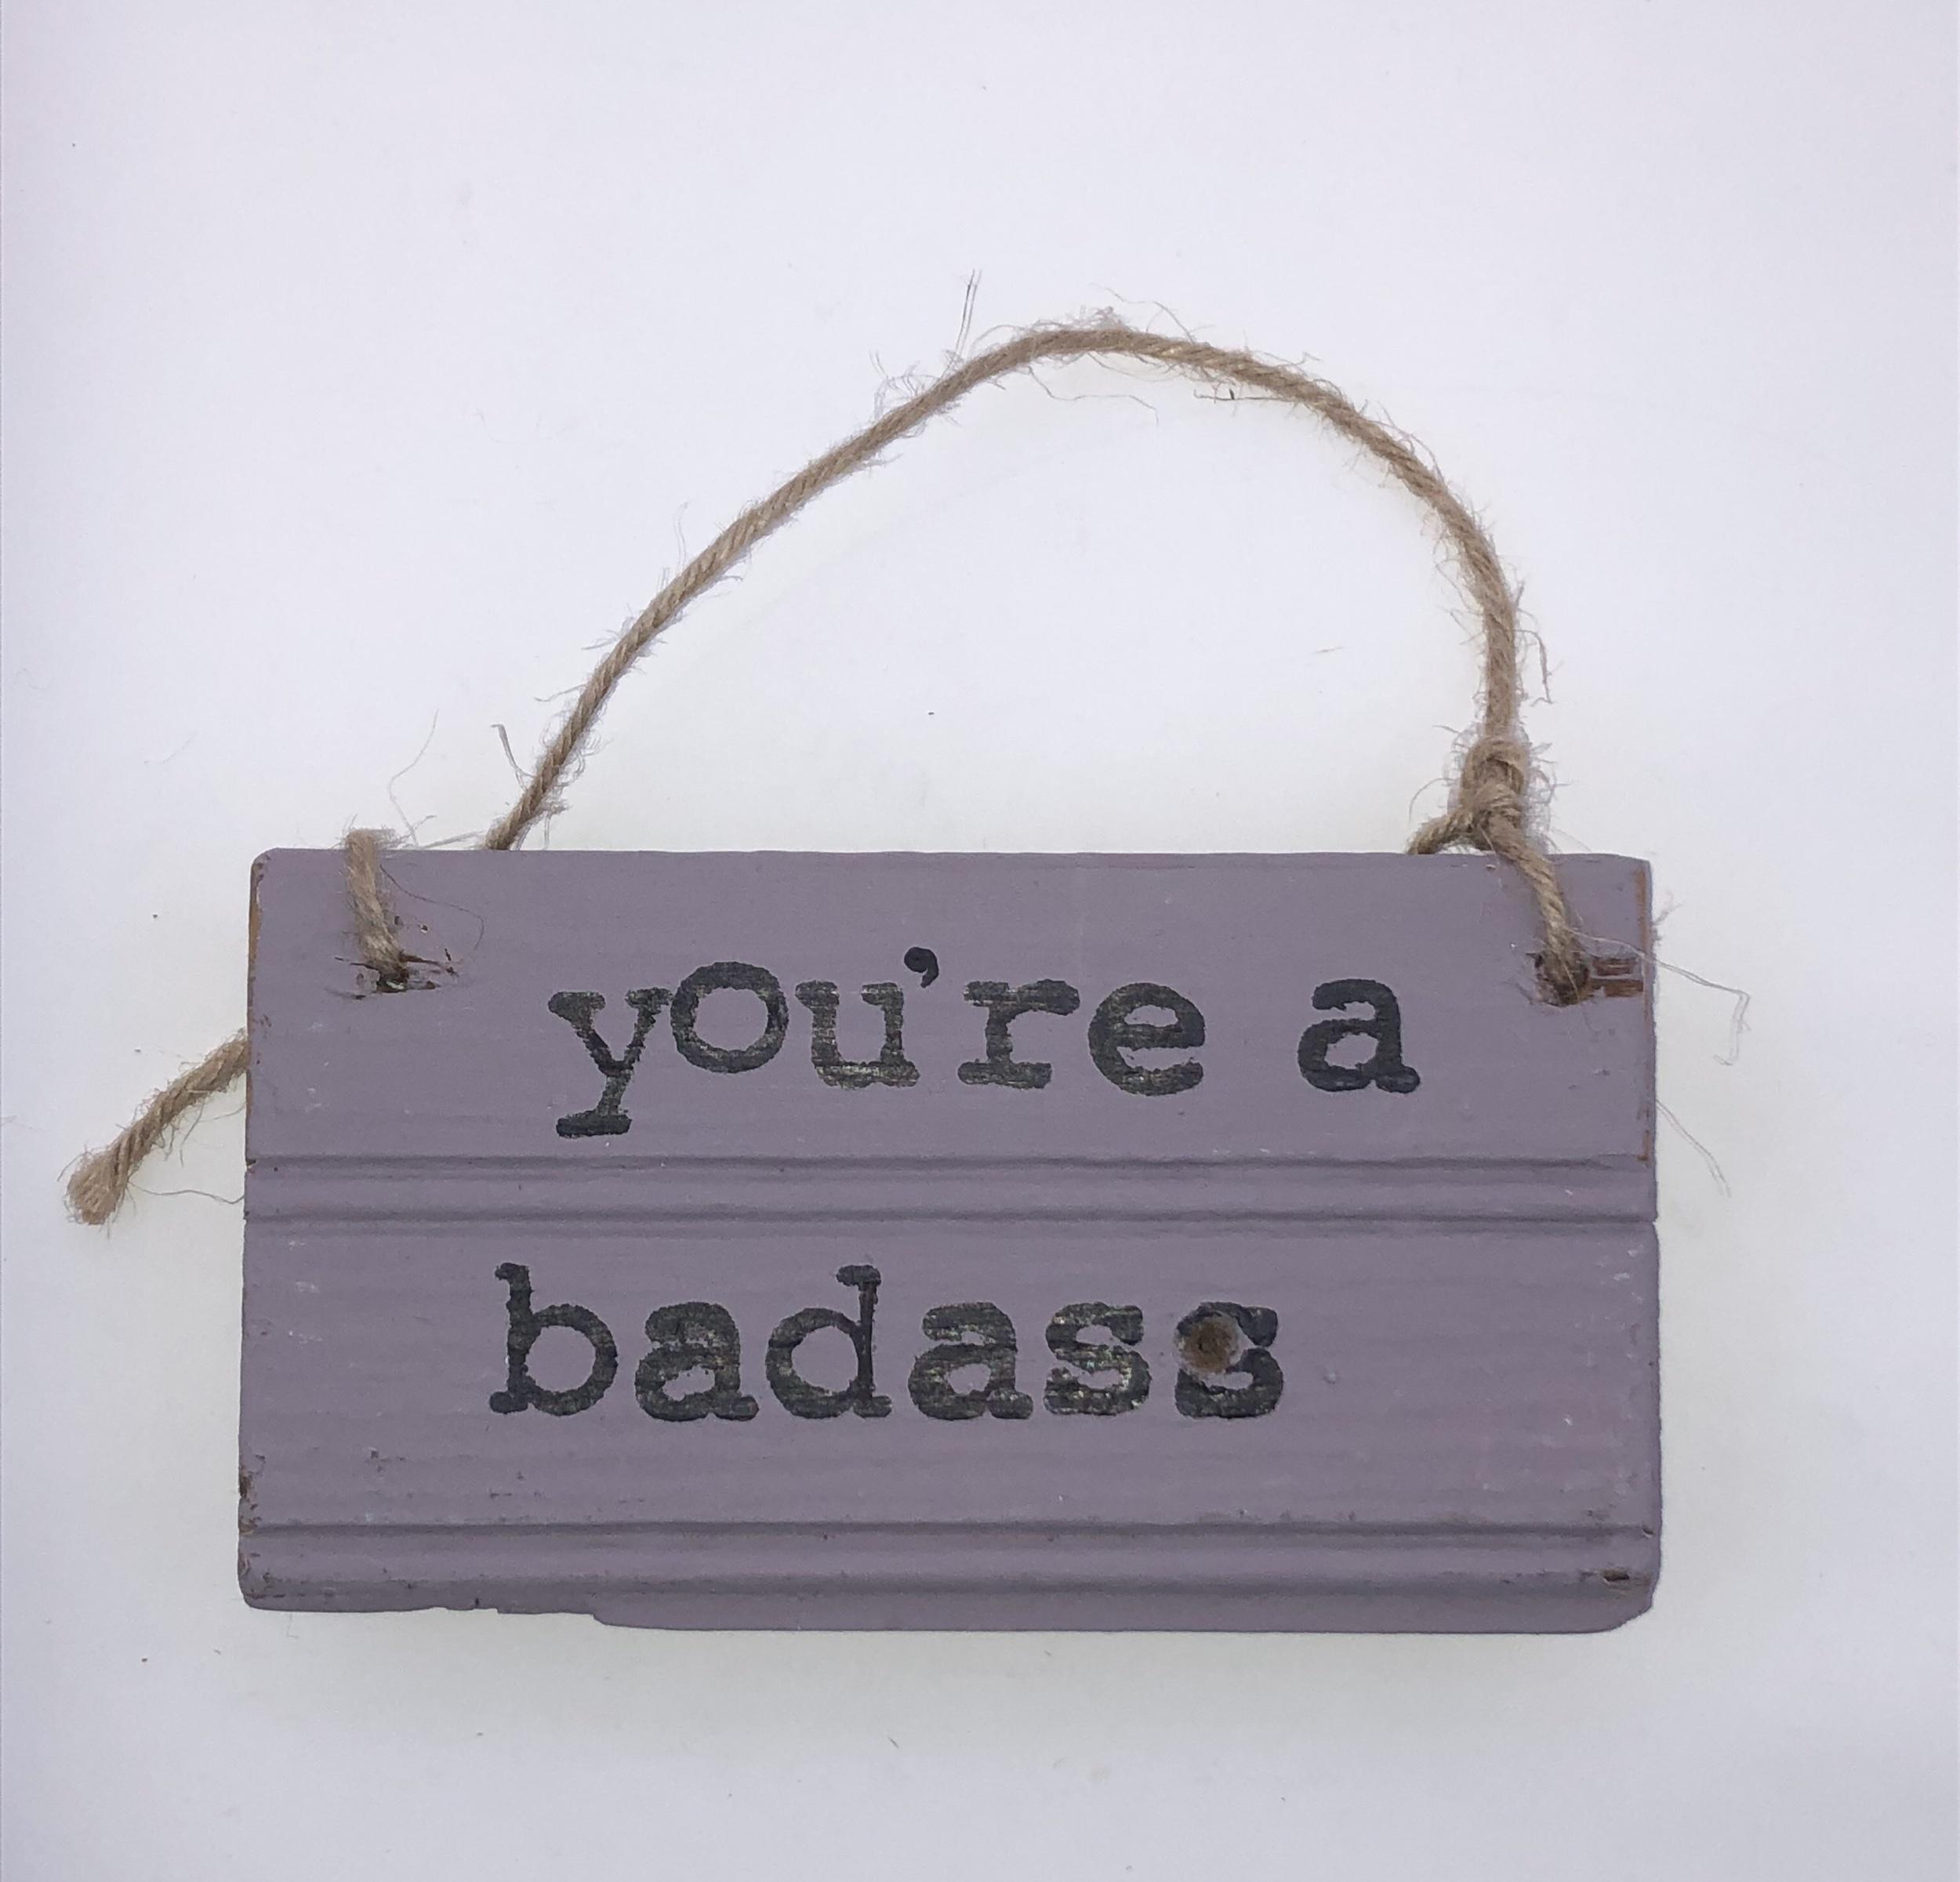 You are badass.purple sign.jpeg